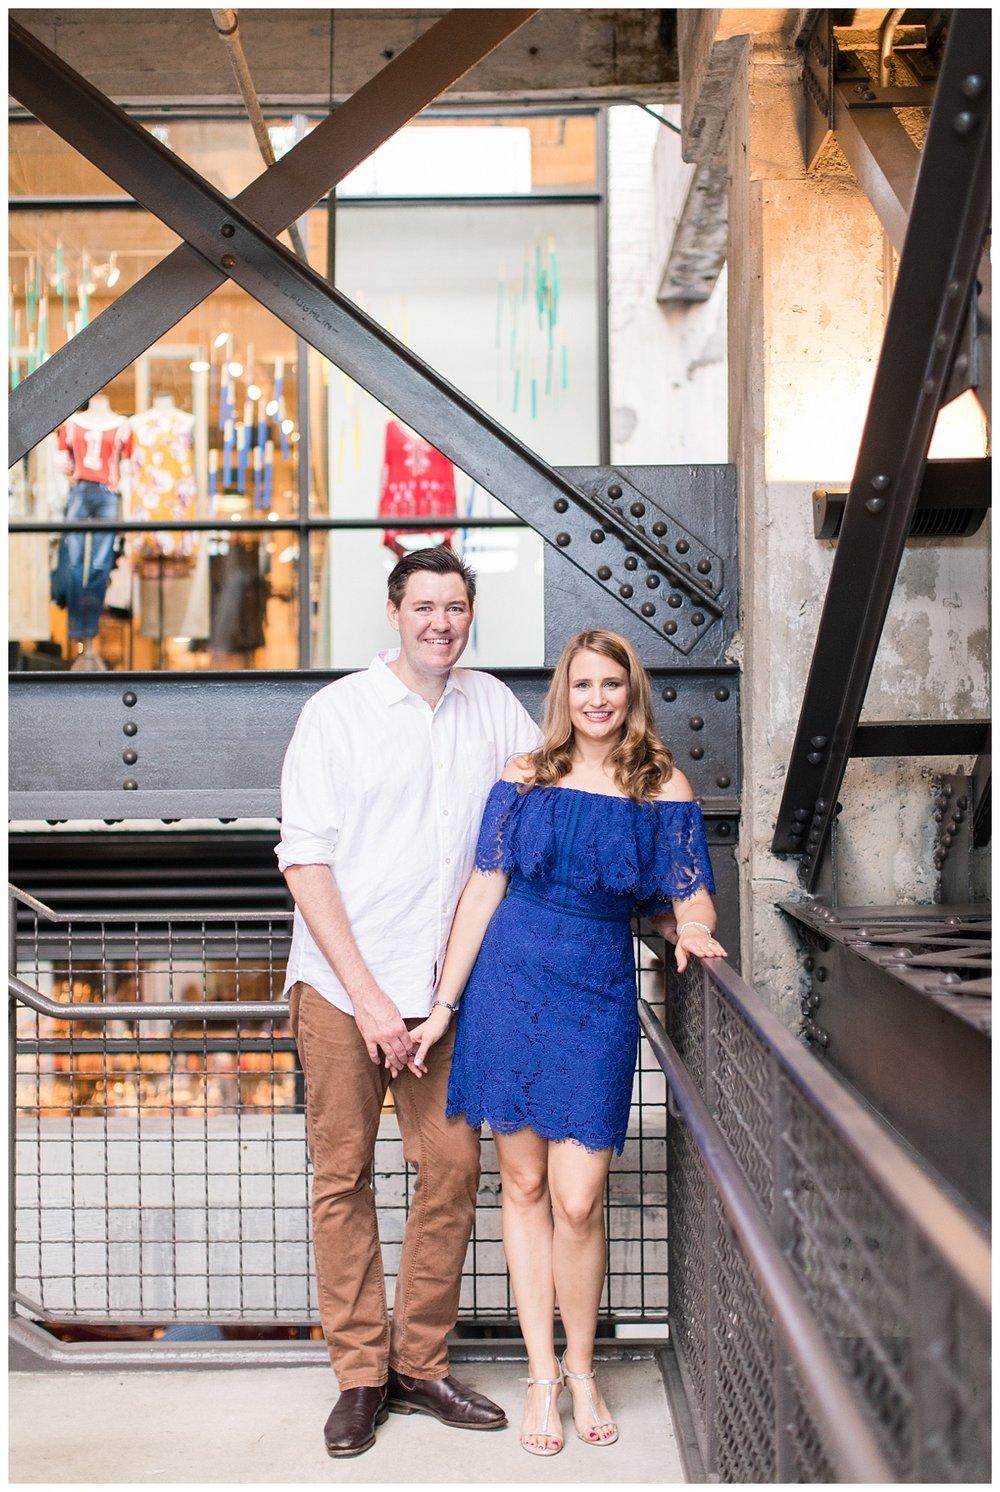 Engagement Pictures_KIm and Hamish_Abby Breaux Photography_Atlanta_Ponce City Market_Jackson Street Bridge_0008.jpg